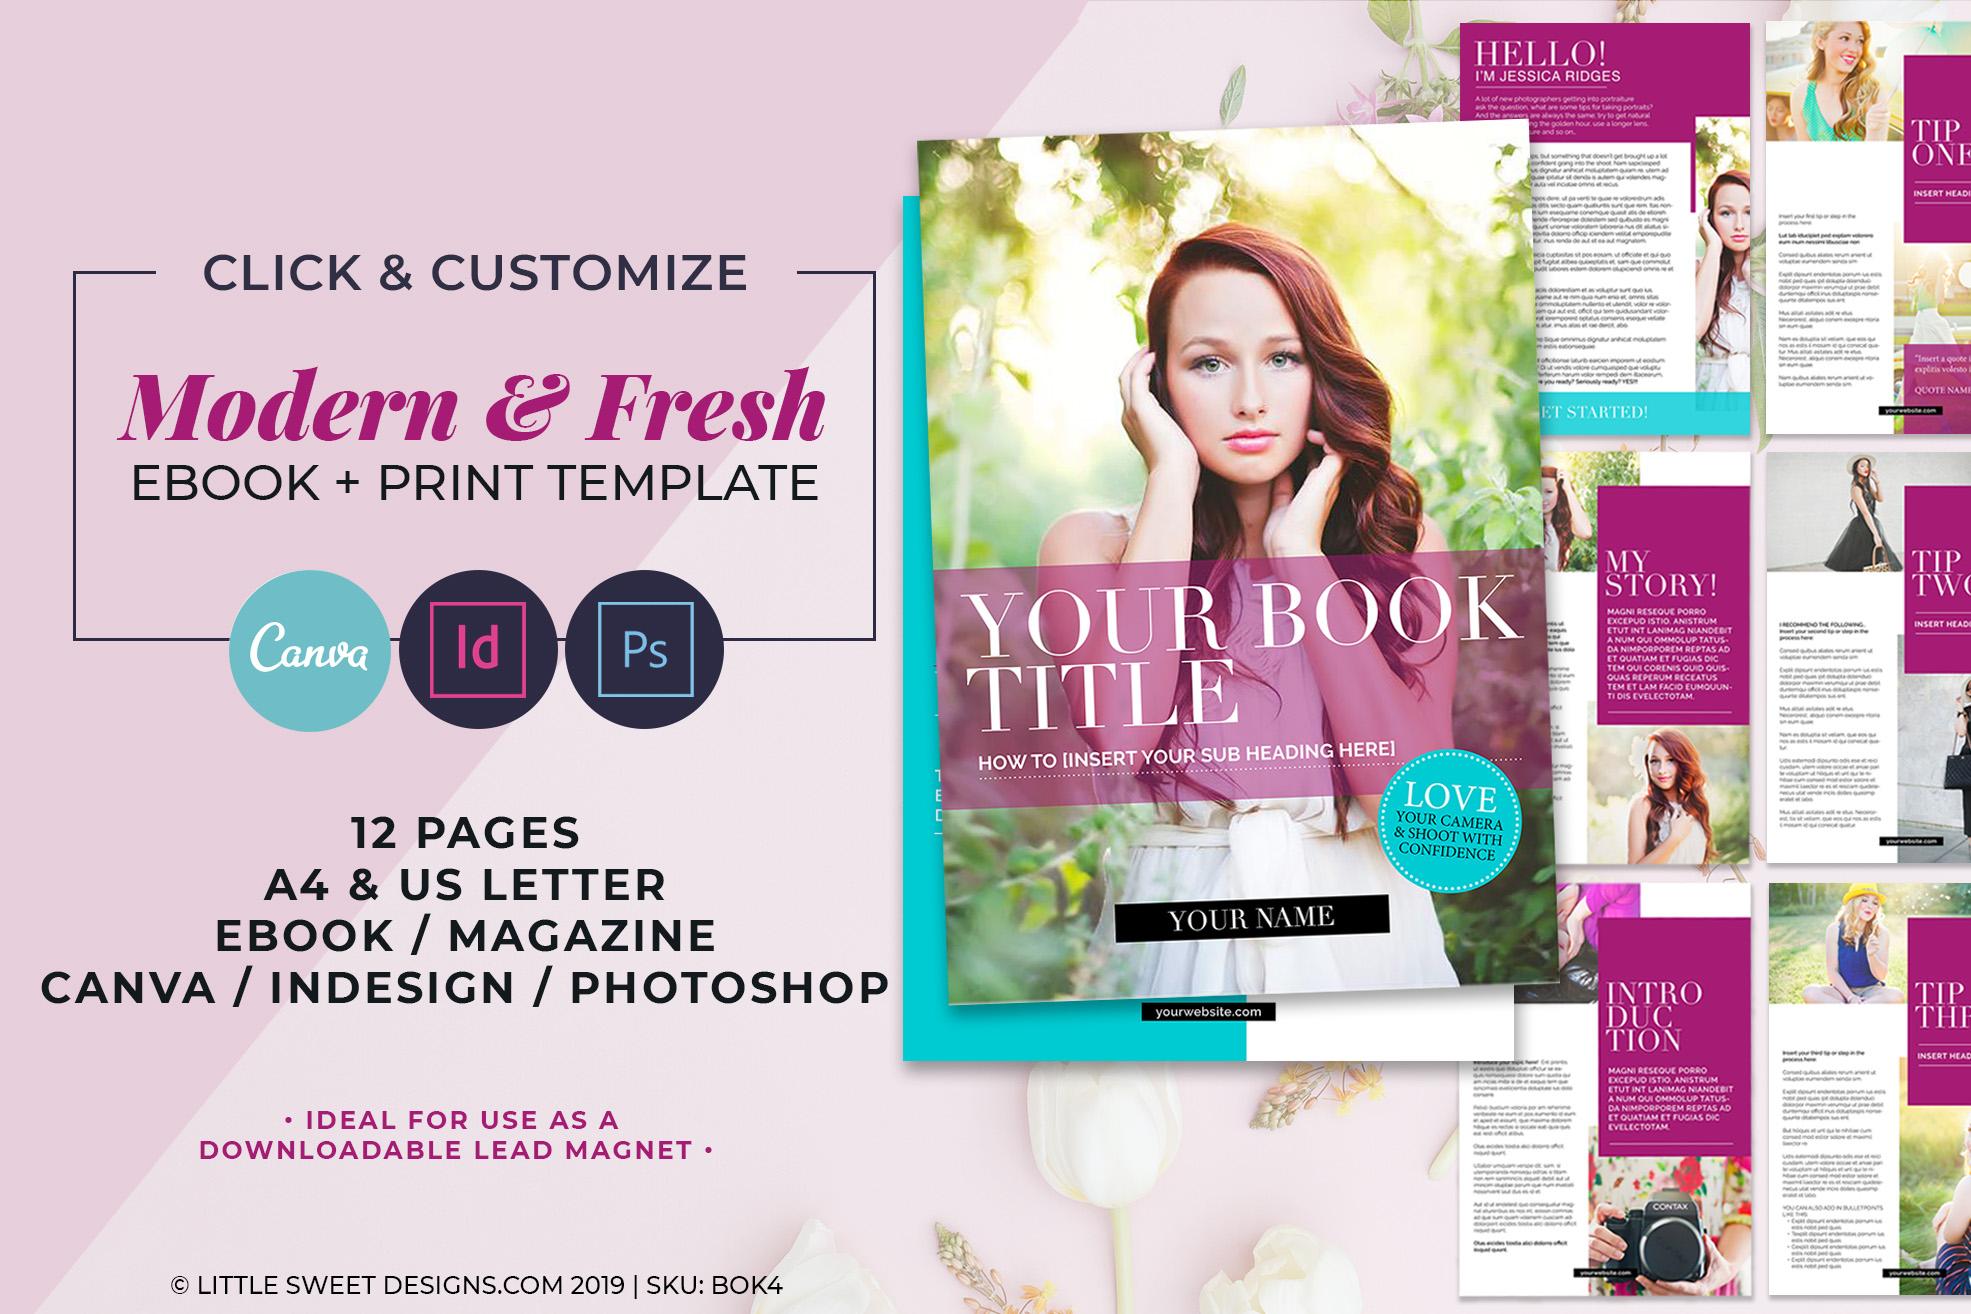 Little+Sweet+Designs+eBook+Magazine+Template+-BOK4-.jpg